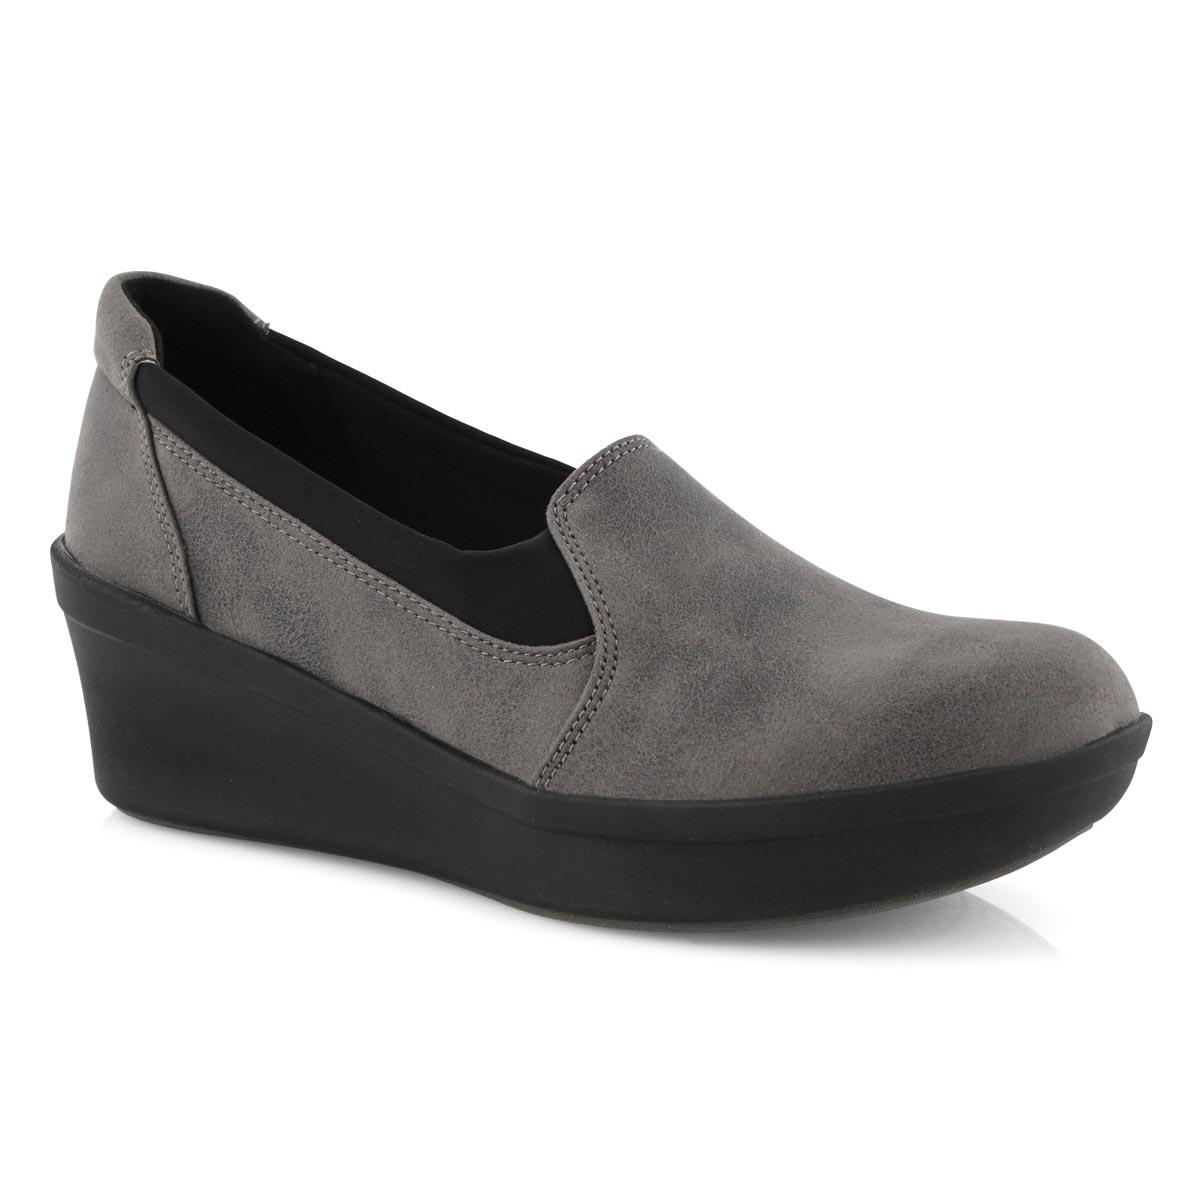 Lds Step Rose Moon grey slip on shoe